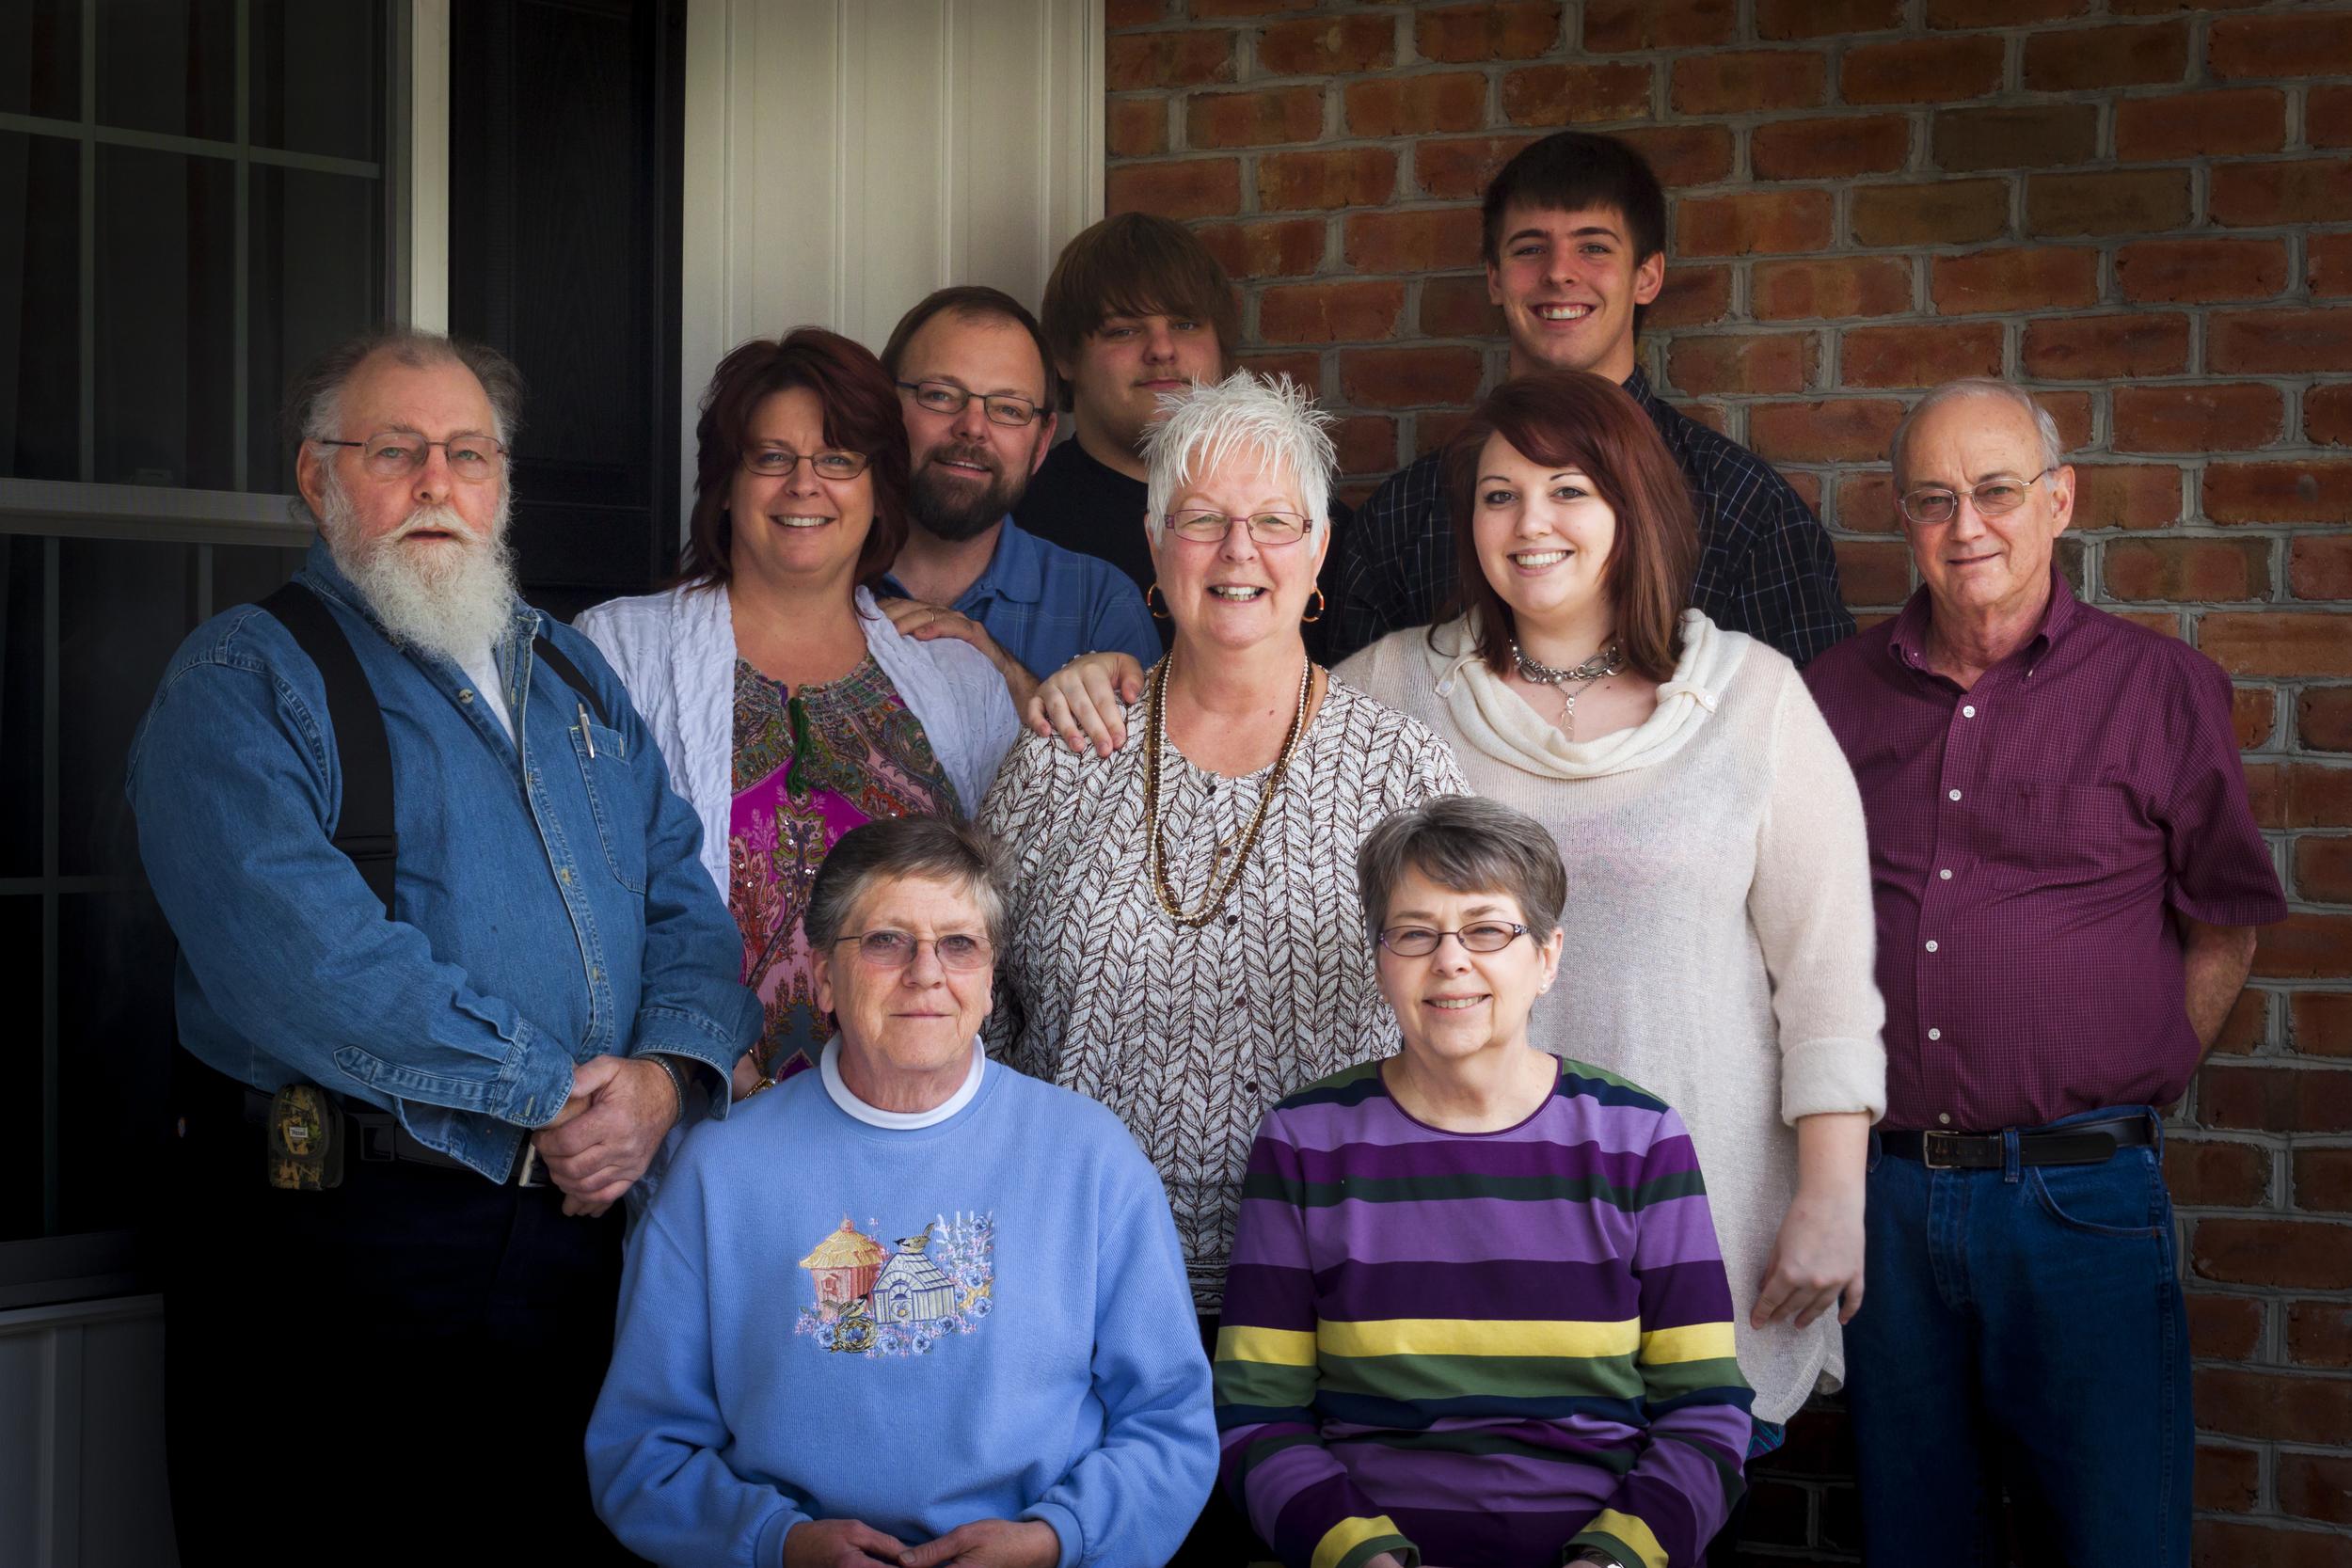 Theaforementionedfamily photo.